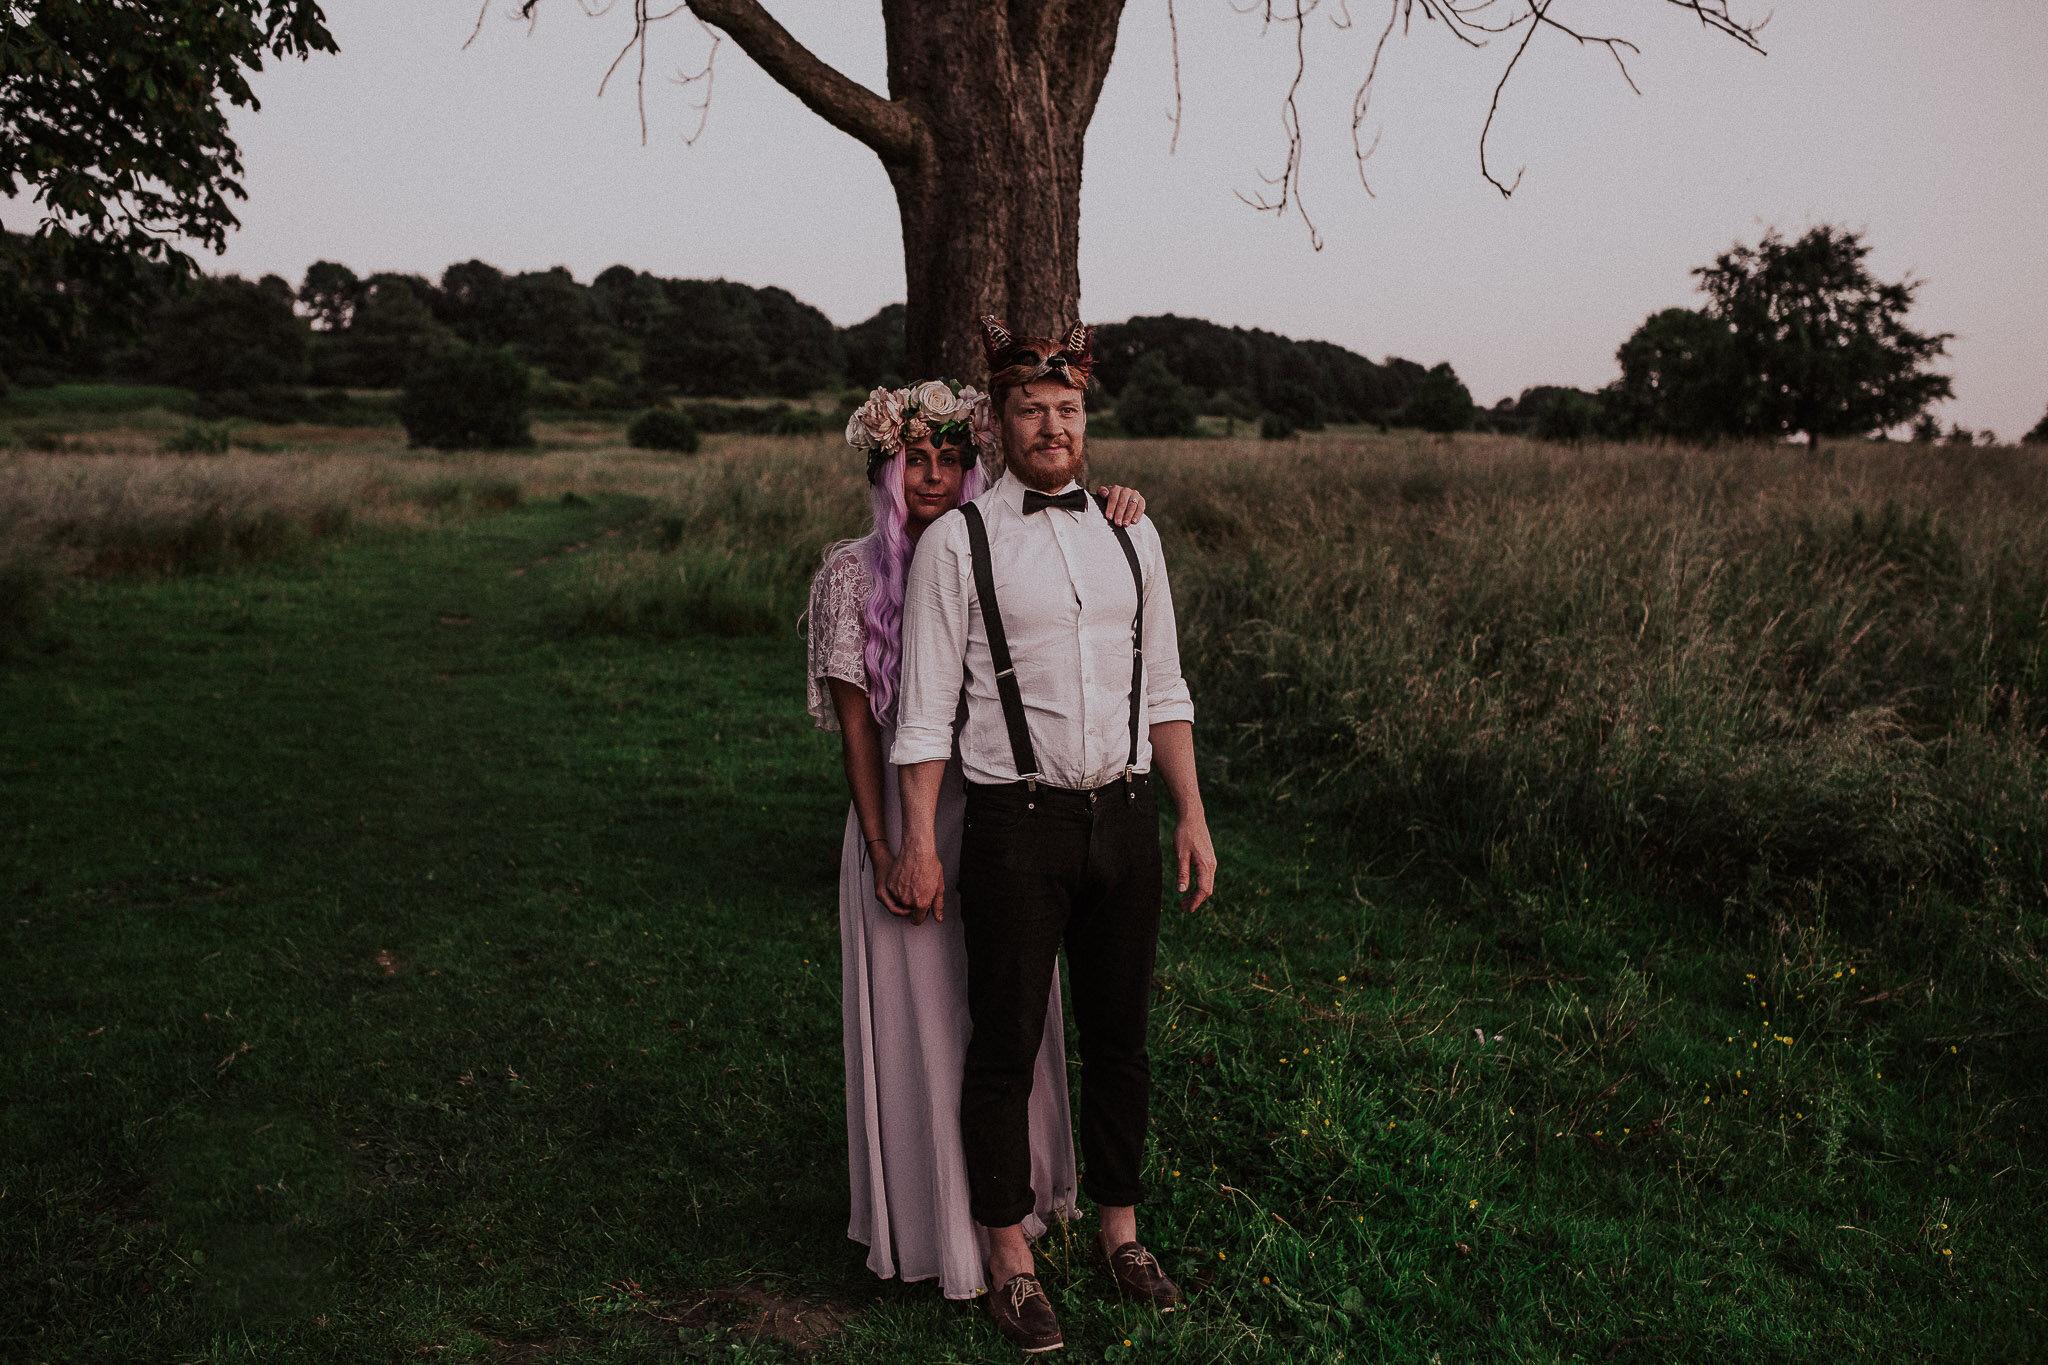 E+M_Lincolnshire_Wedding_Photographer_Steven Haddock-25.jpg